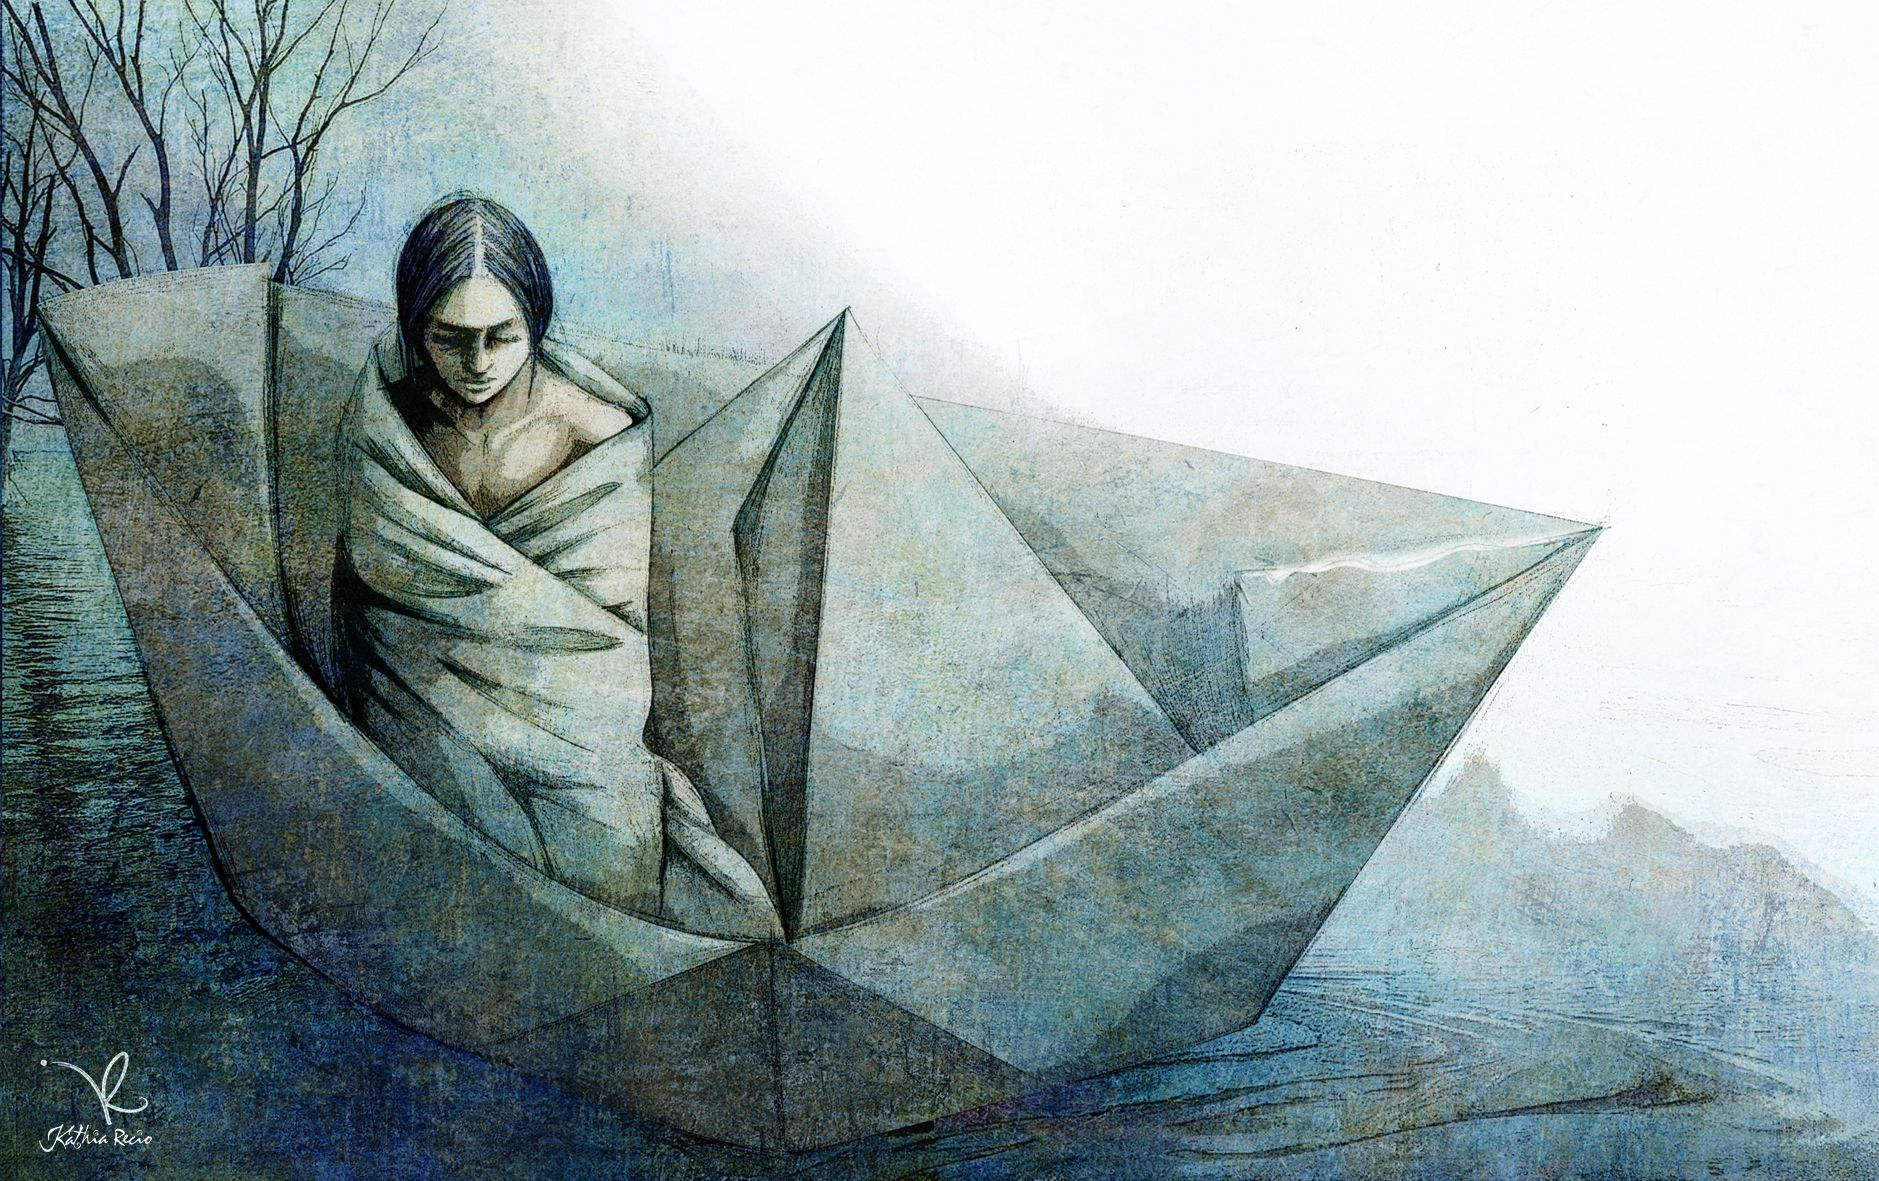 Galeria Poesia Modernista Grafica